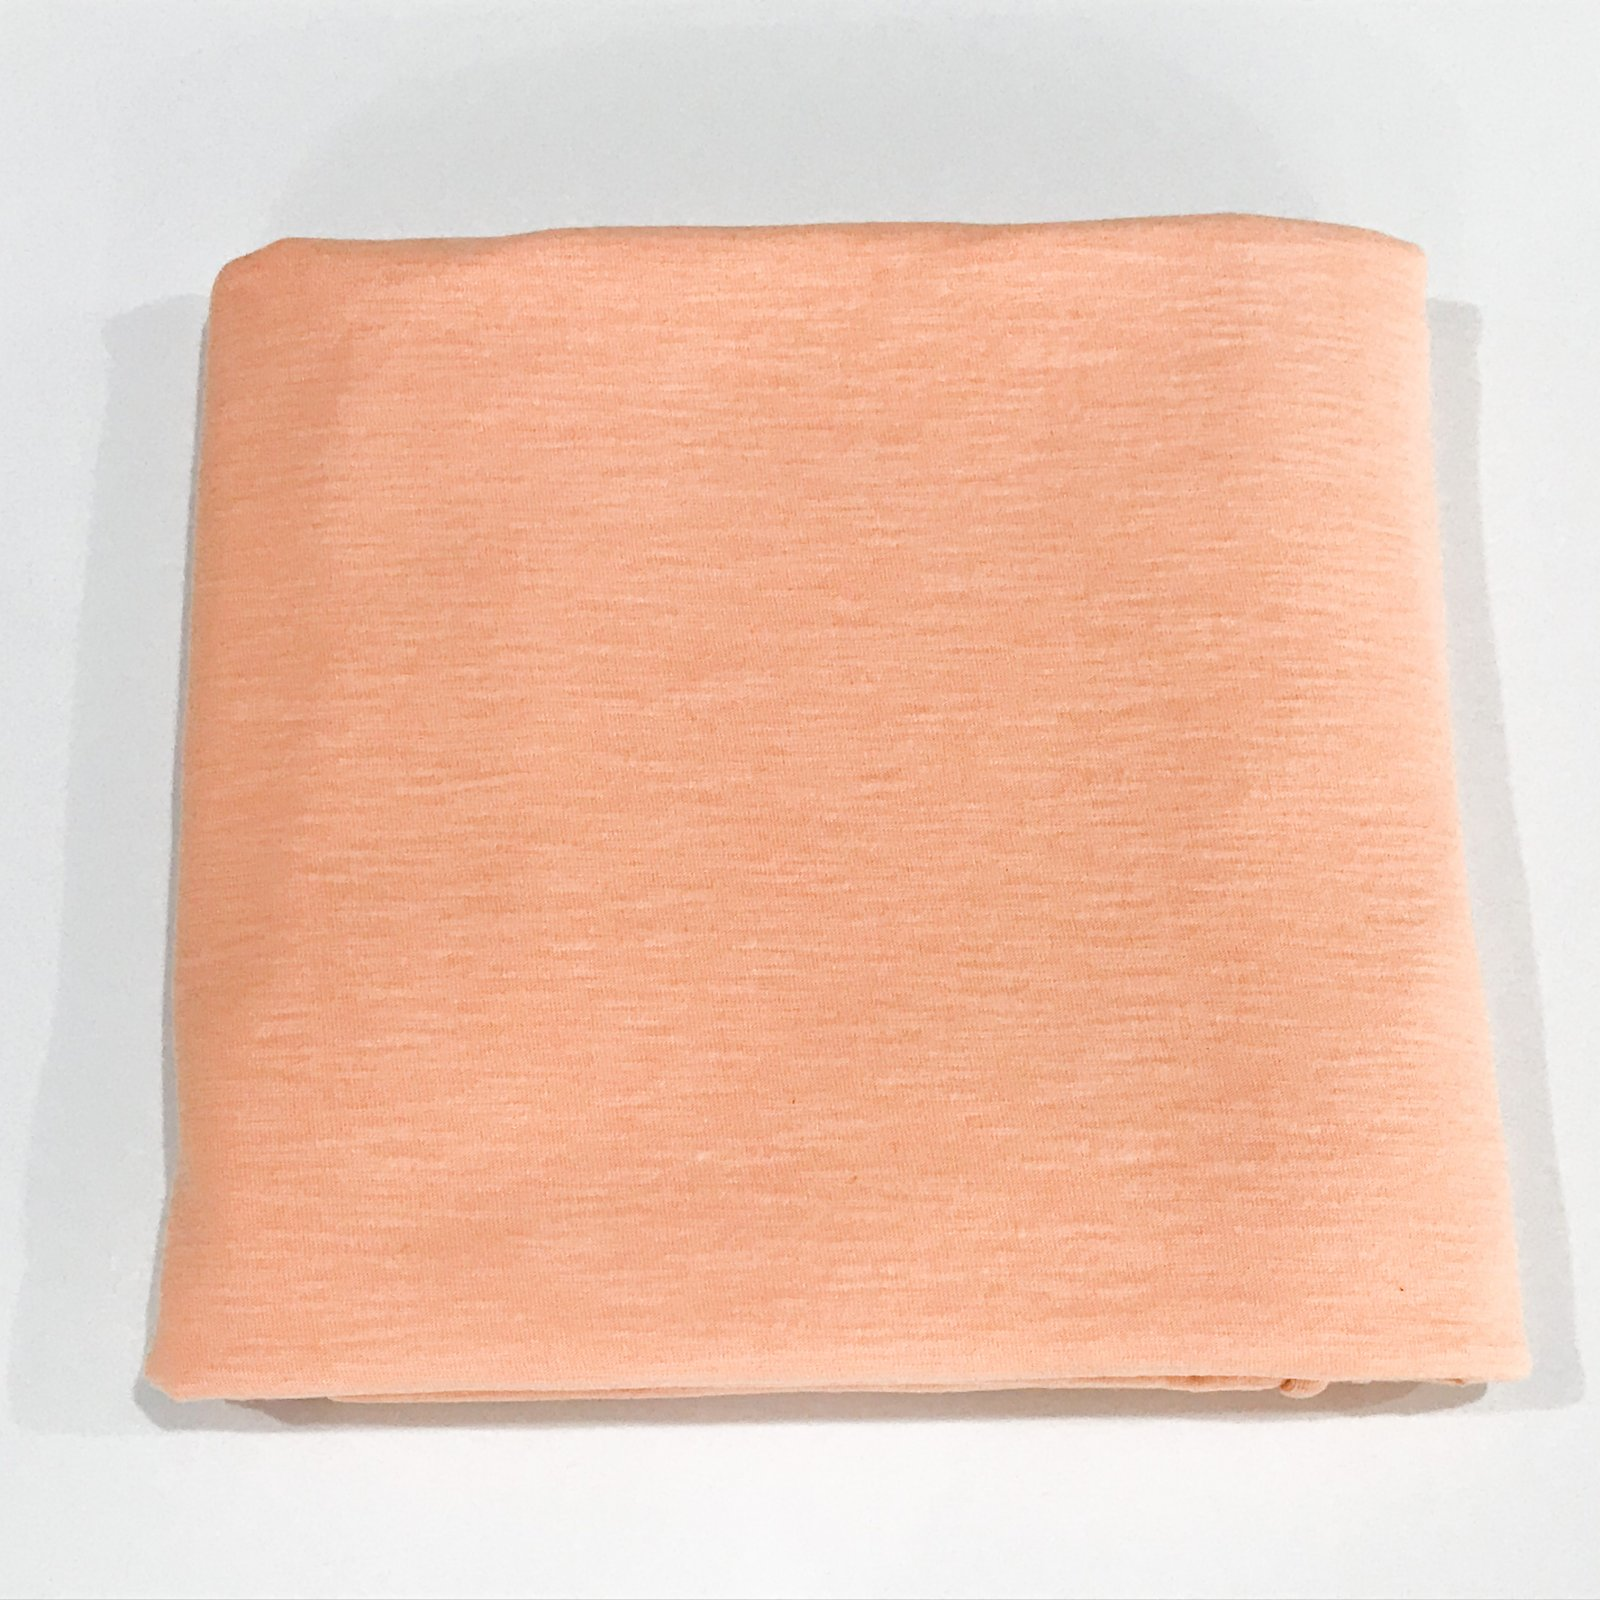 1 1/2 yards - Cotton Slub Knit - Organic Peach